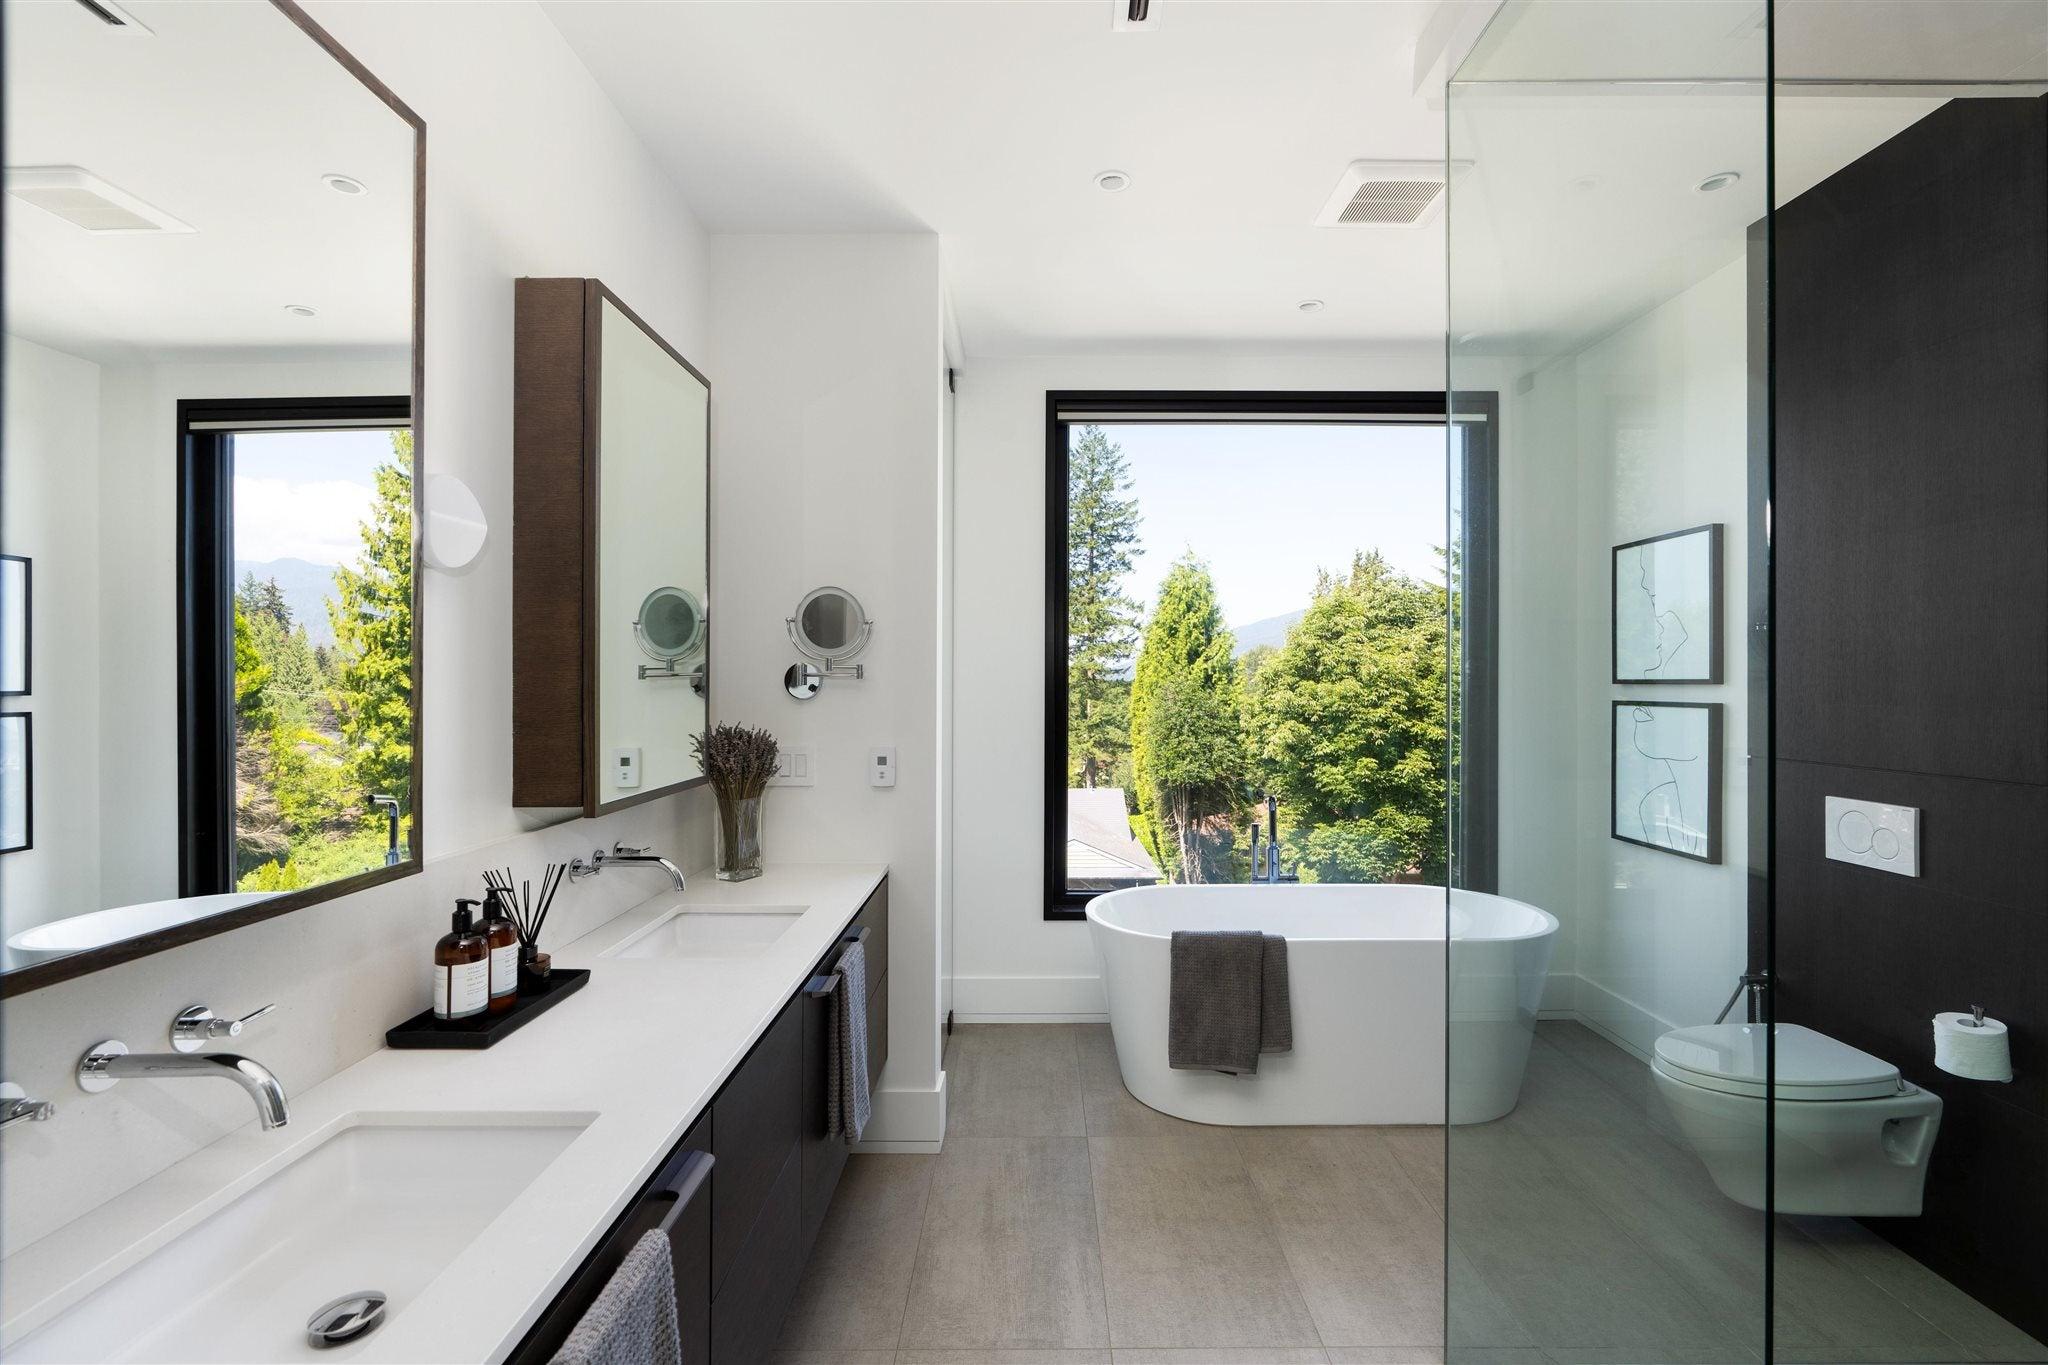 276 SANDRINGHAM CRESCENT - Upper Lonsdale House/Single Family for sale, 7 Bedrooms (R2617703) - #25